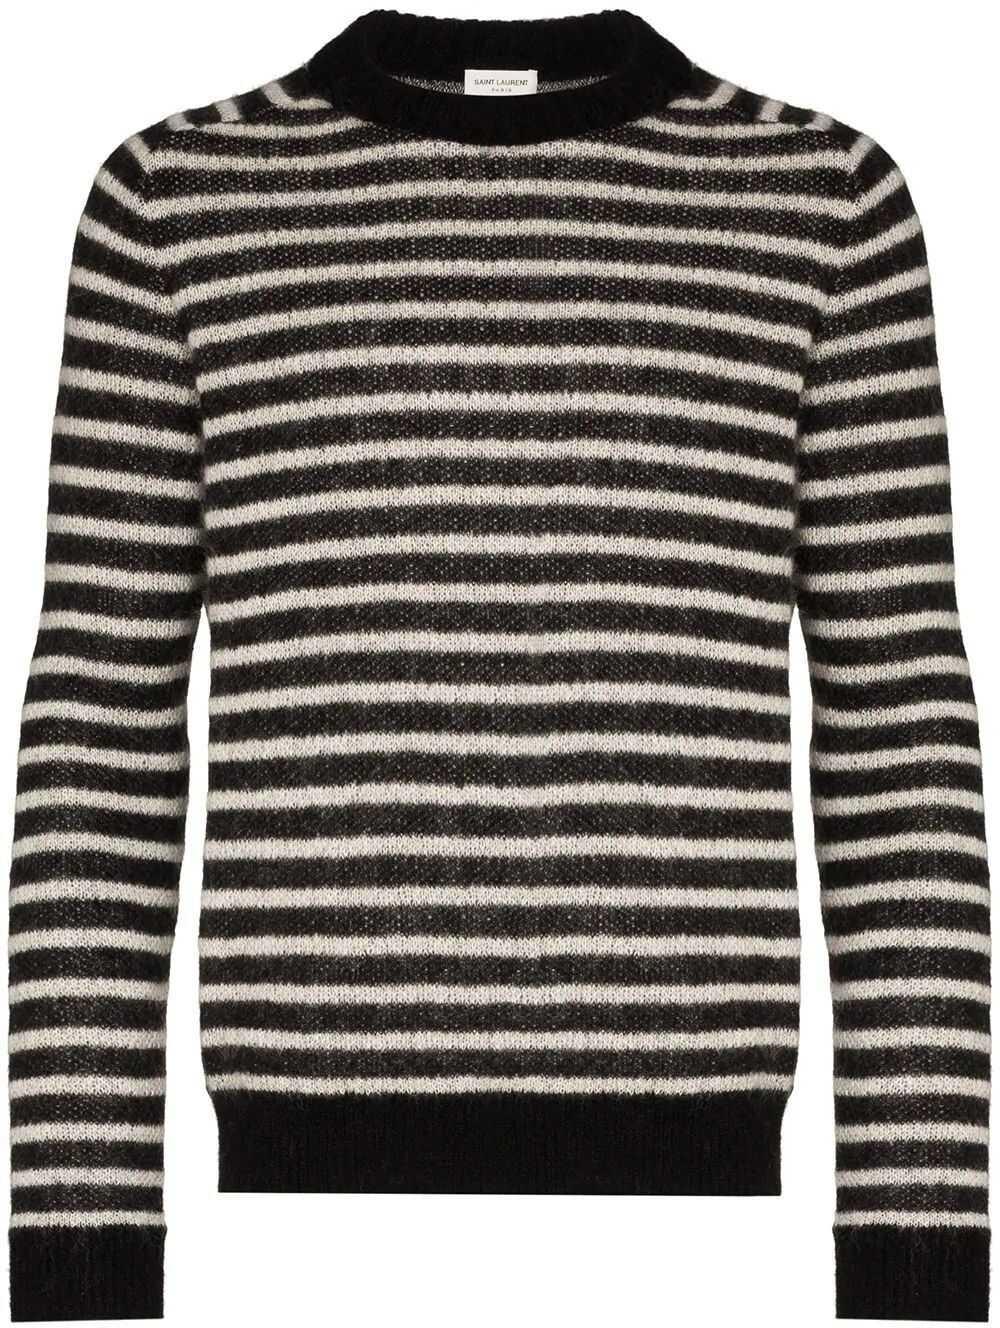 Saint Laurent Wool Sweater BLACK